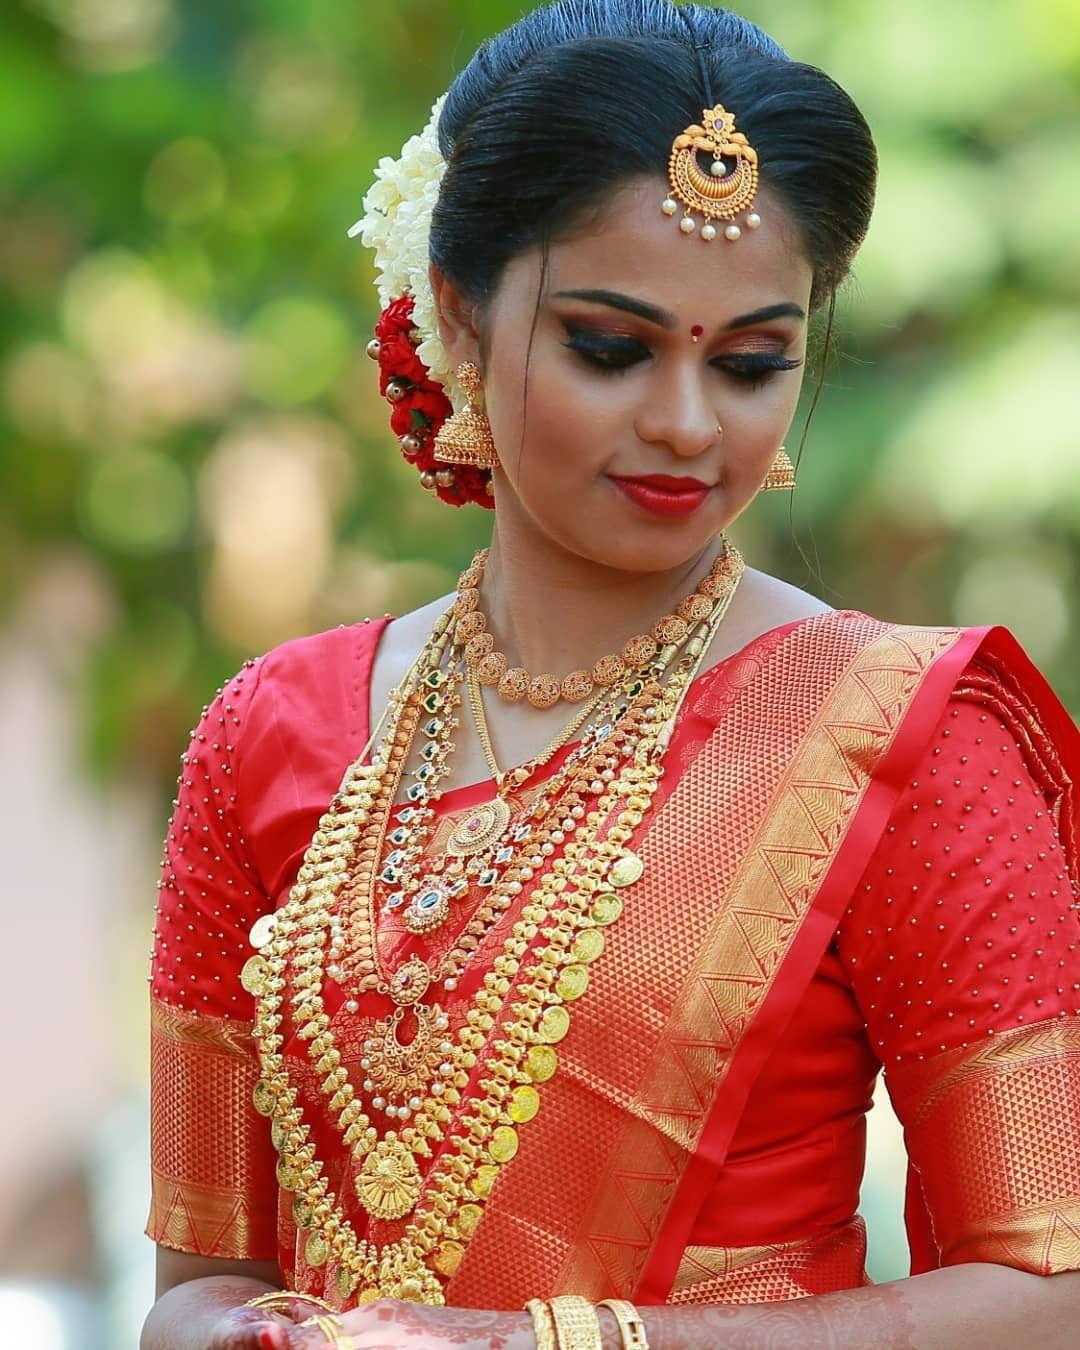 kerala bridal hairstyles for short hair | Hindu Wedding